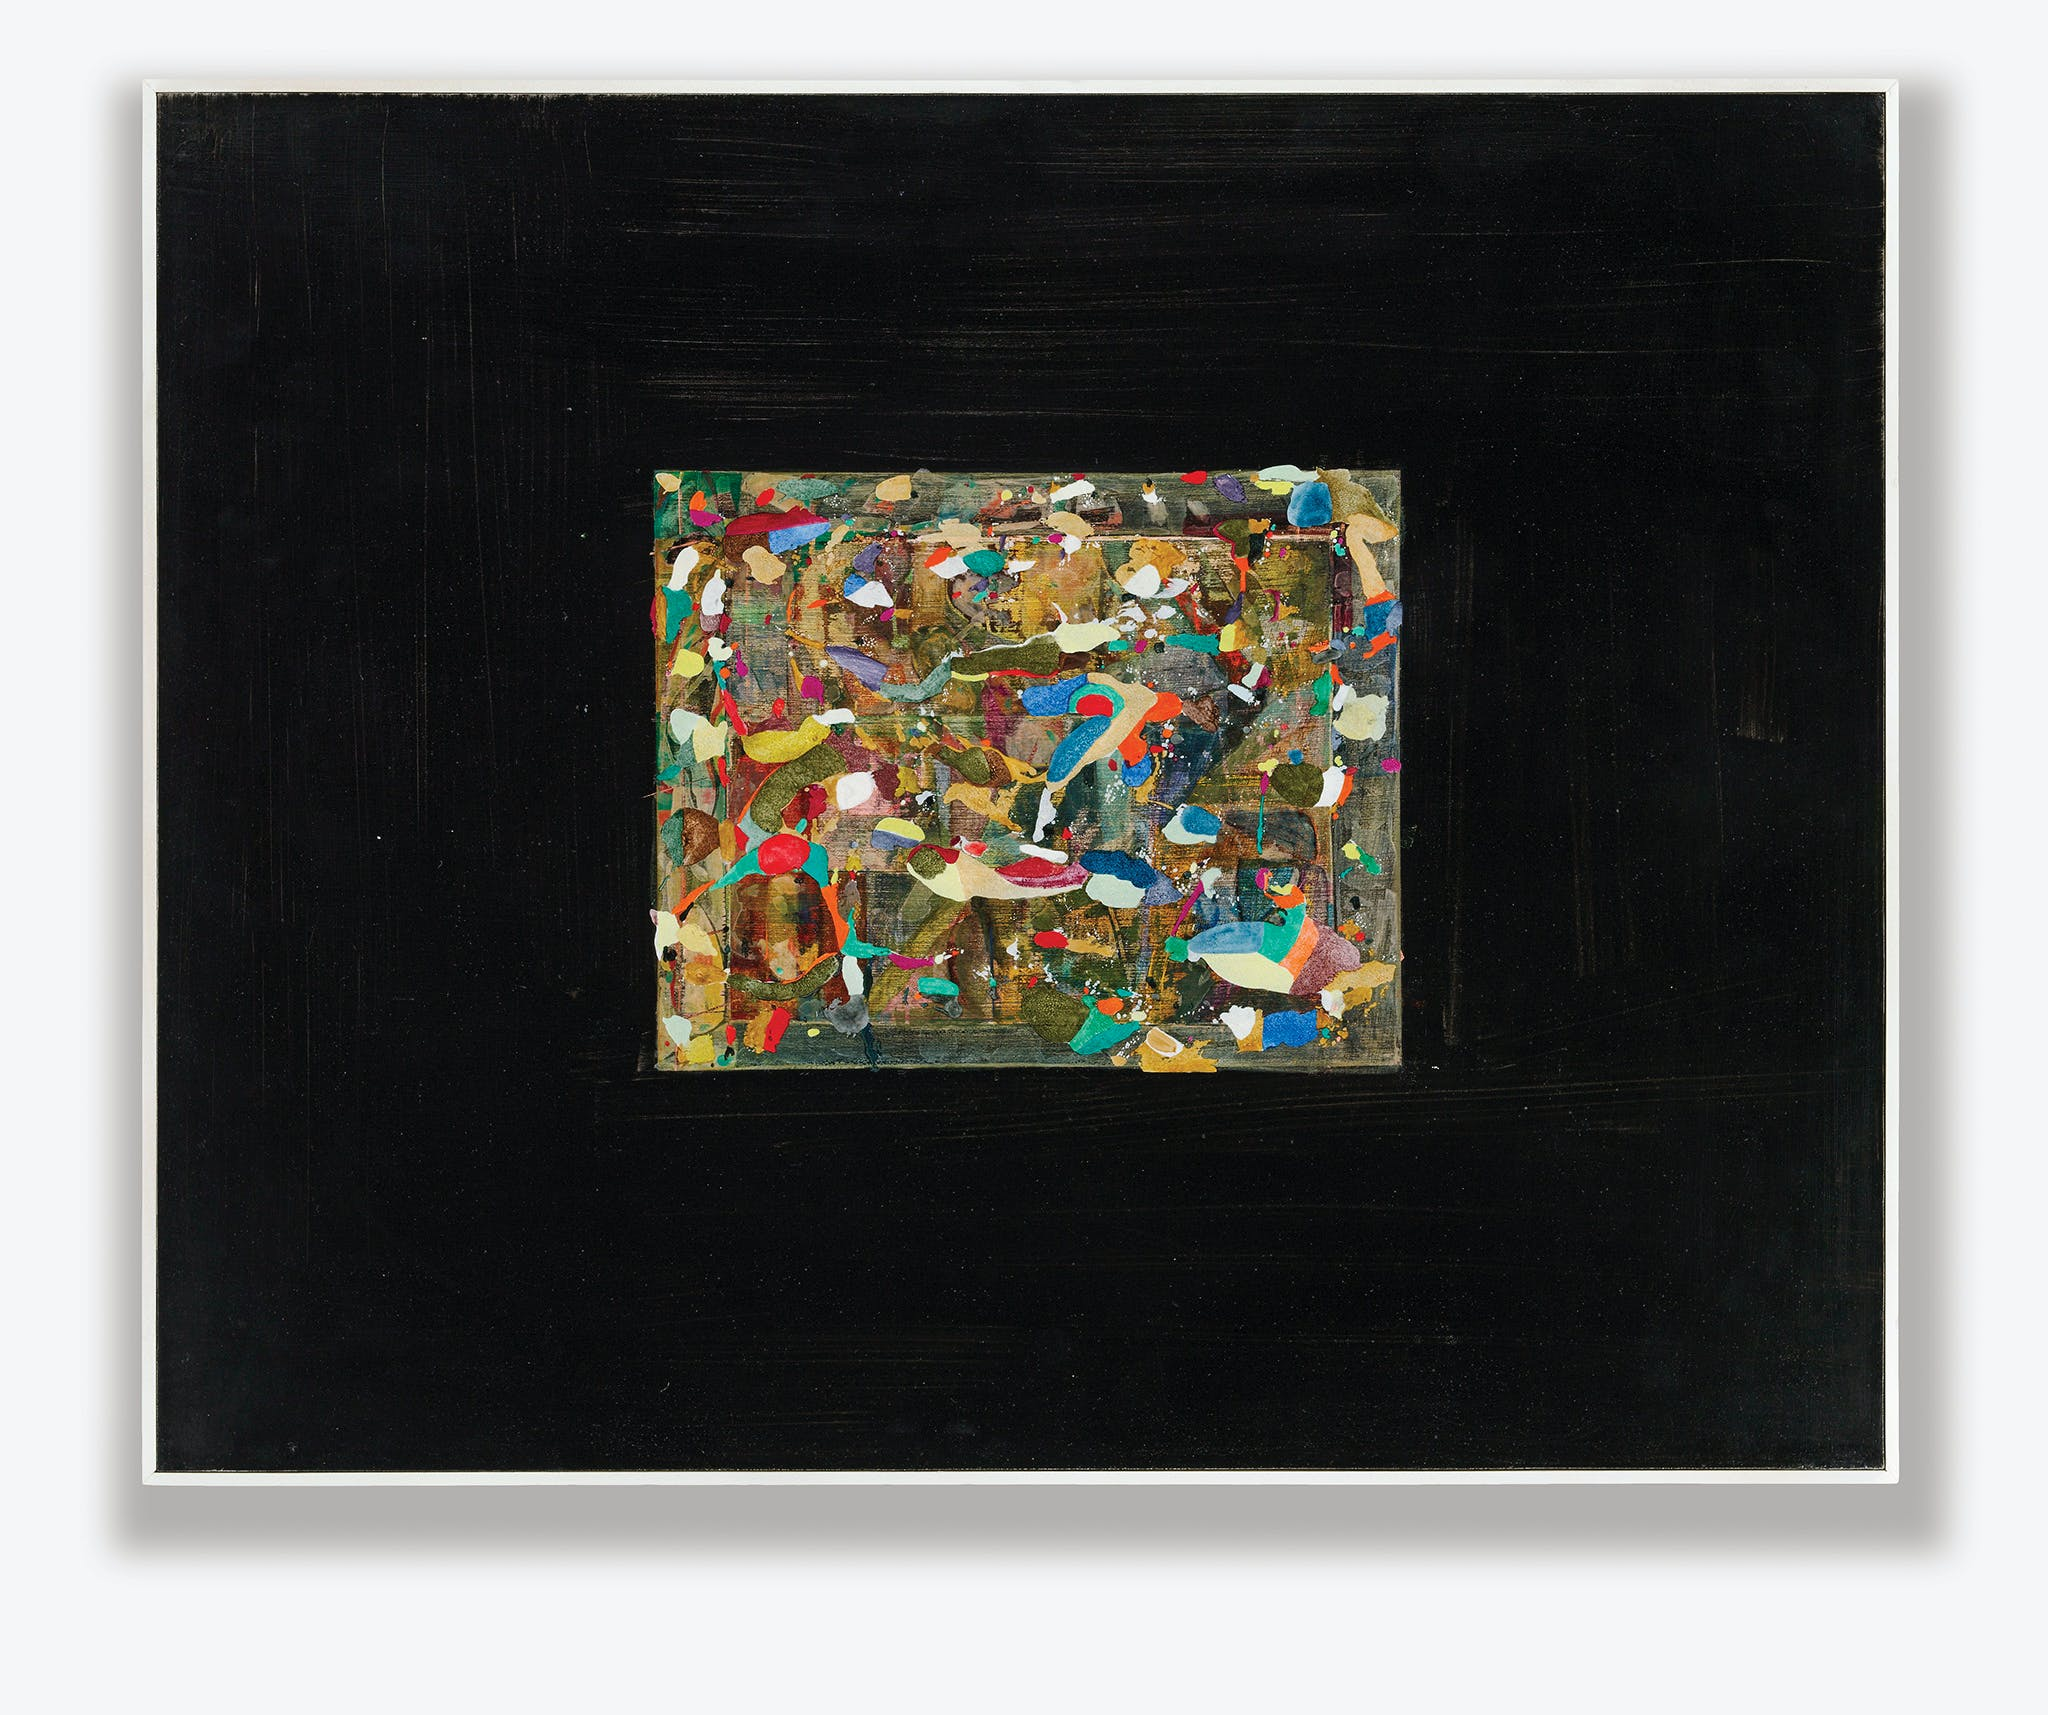 Scott Olson, Untitled, 2012